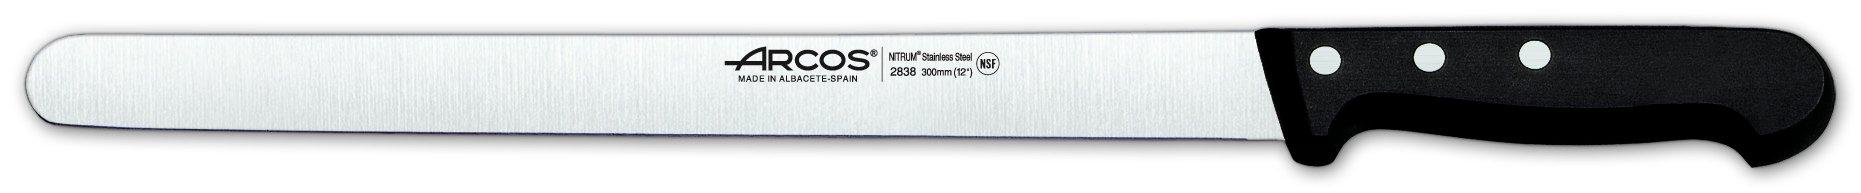 Arcos 12-Inch 300 mm Universal Slicing Flexible Ham Knife